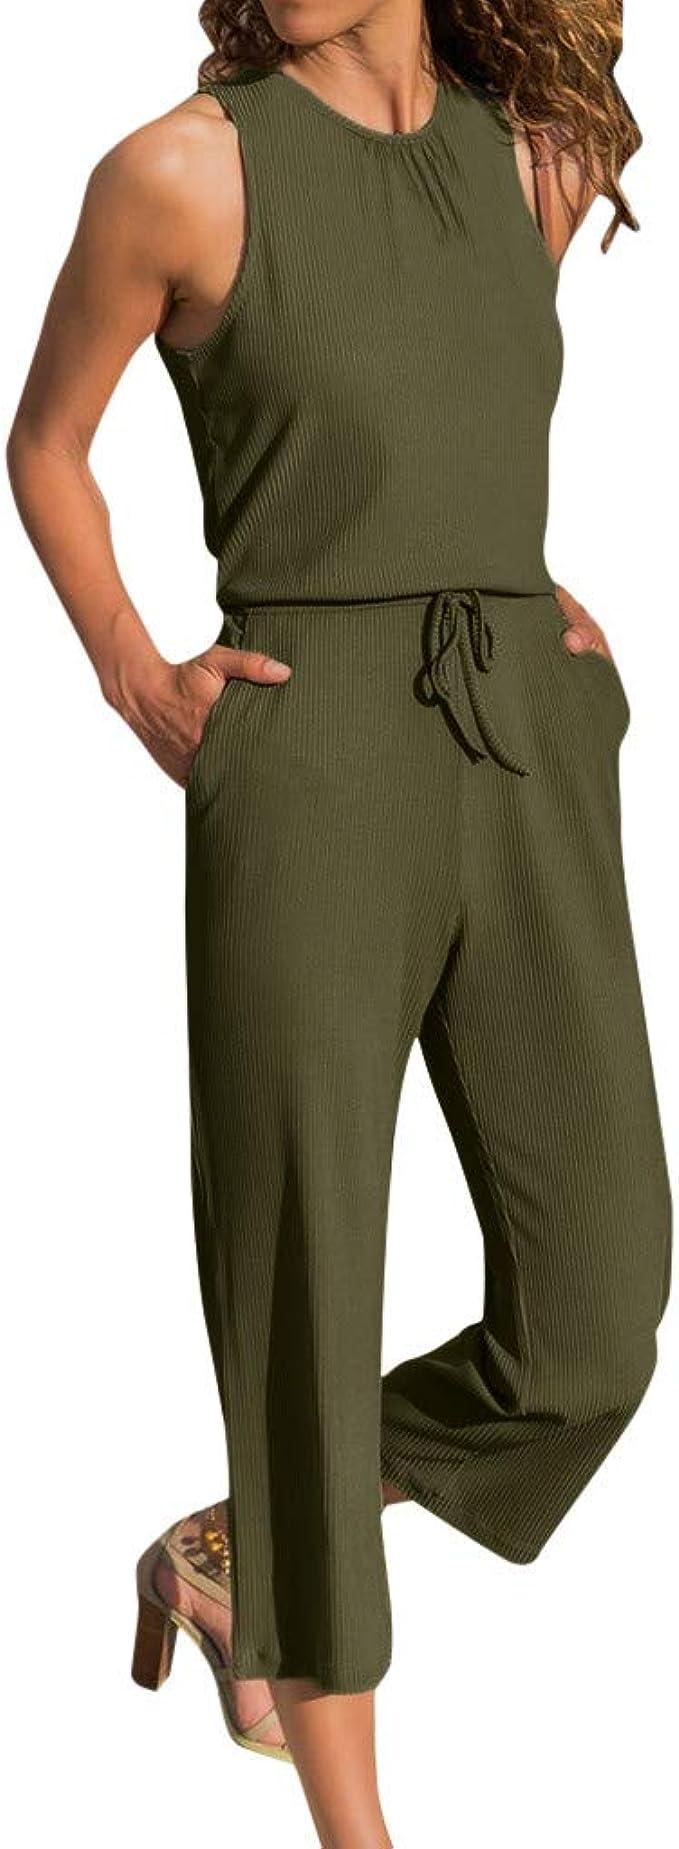 VICGREY Jumpsuit Mujer Elegante – Pantalón Chándal Mujer Jumpsuit ...